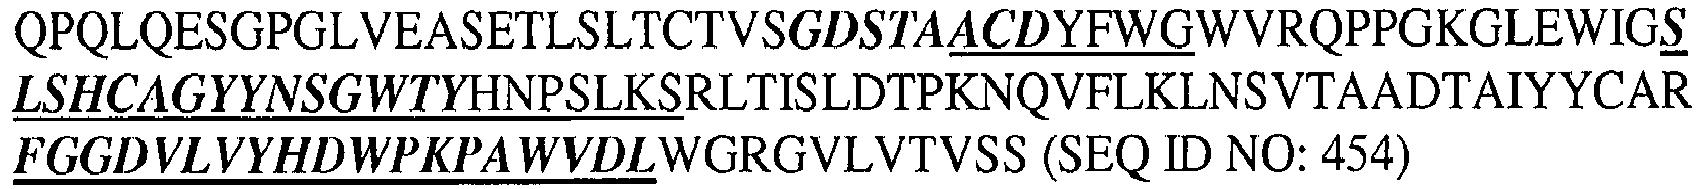 Figure imgb0340